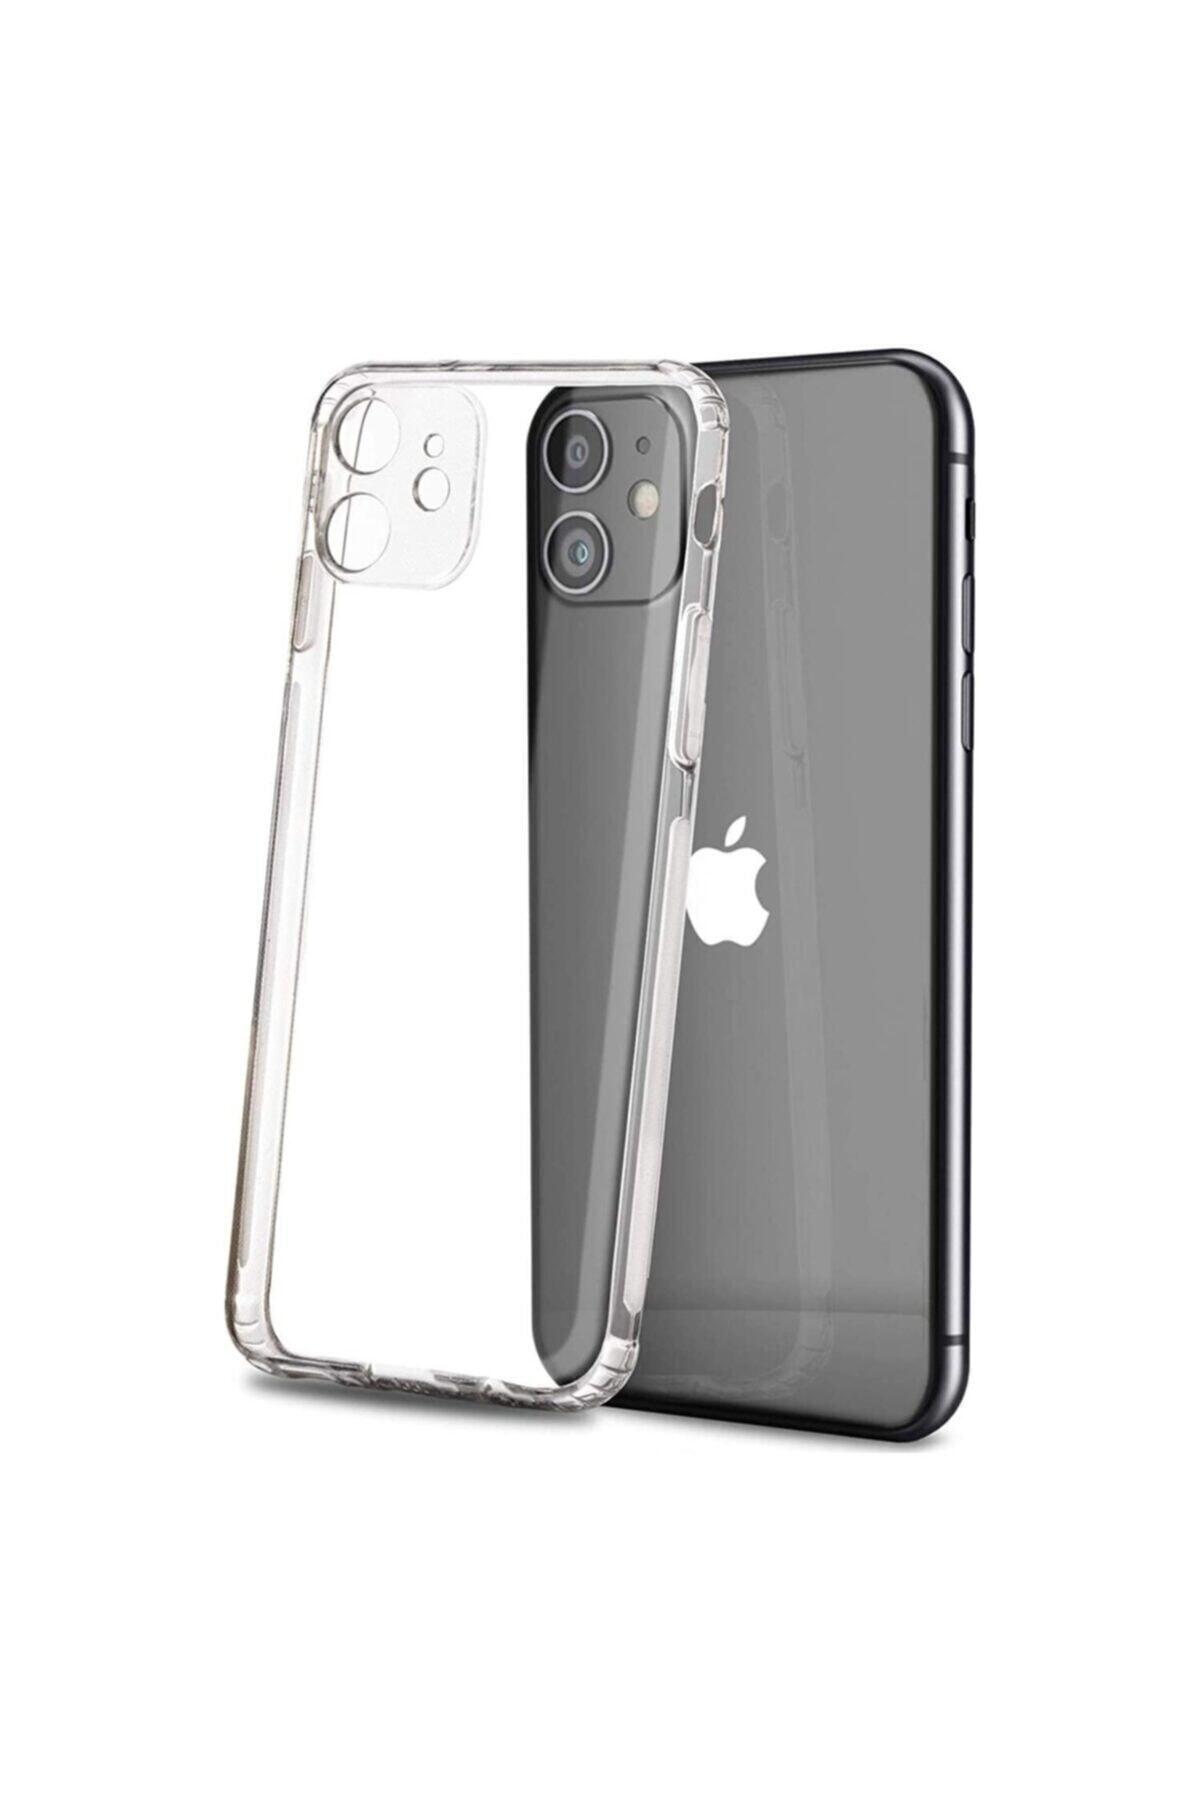 Apple Iphone 12 6.1 Kılıf Kamera Korumalı Tıpalı Şeffaf Kristal Silikon Kapak